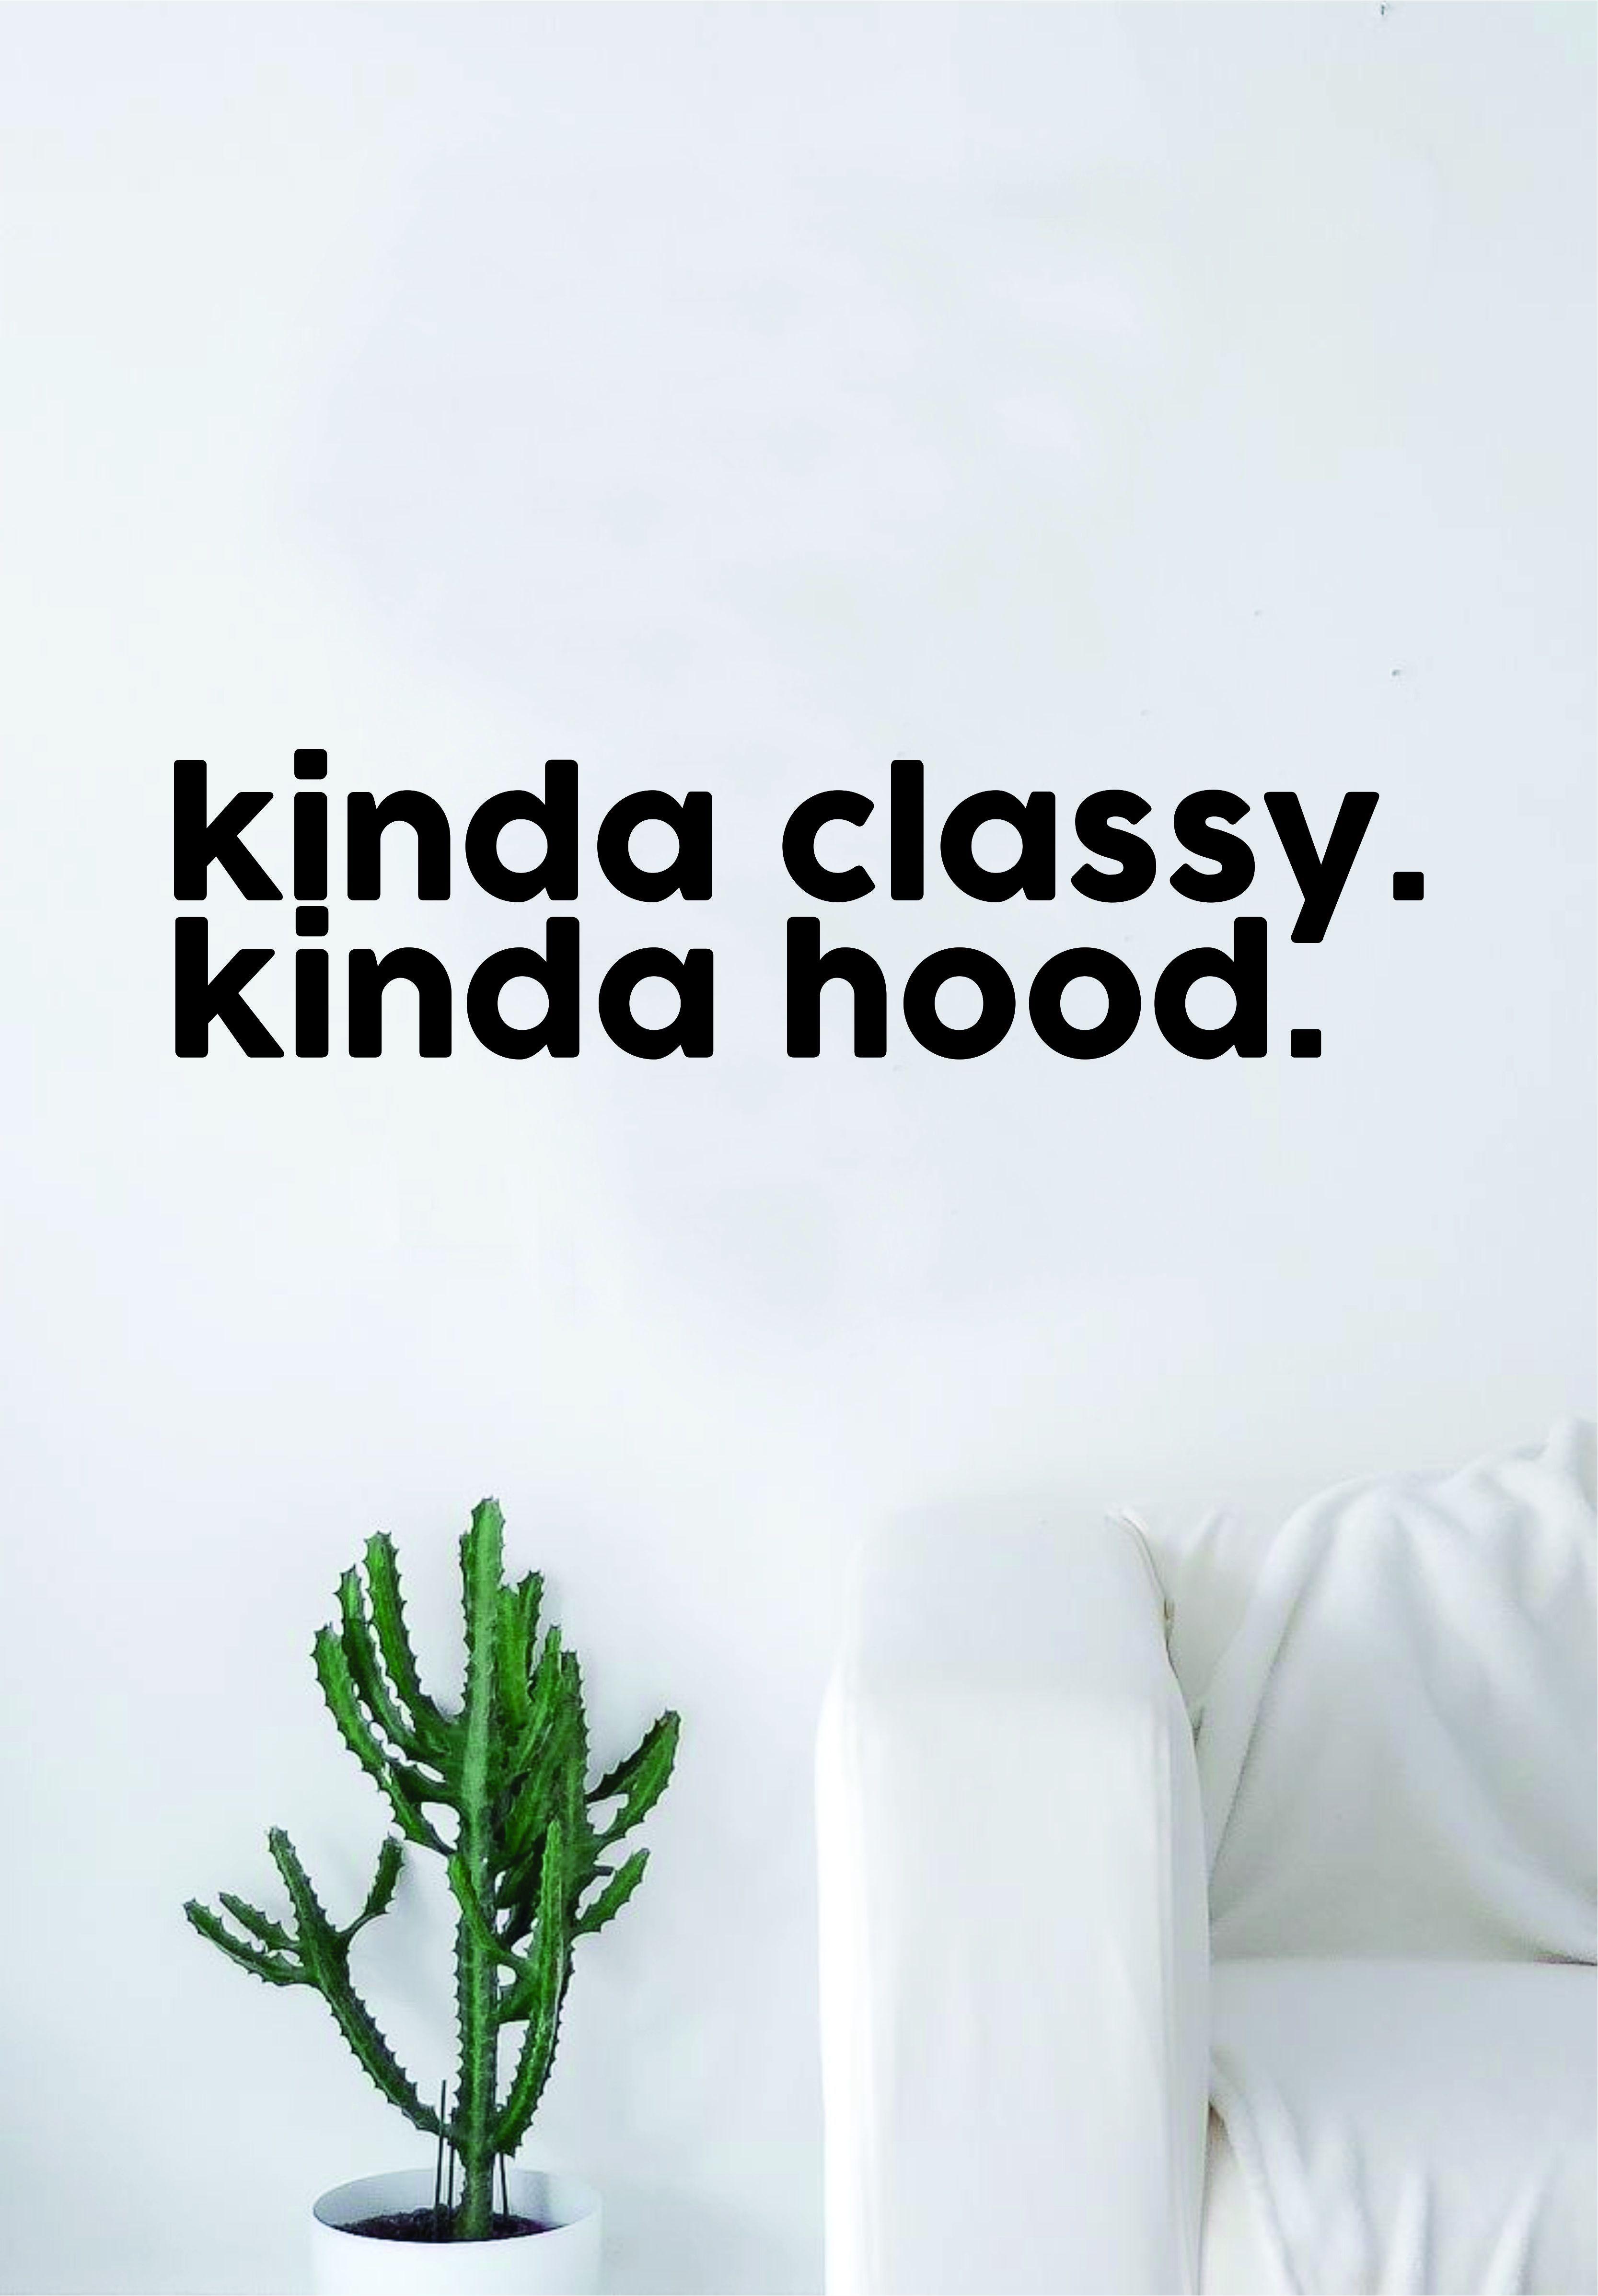 kinda classy kinda hood quote wall decal sticker room art home vinyl rh pinterest com